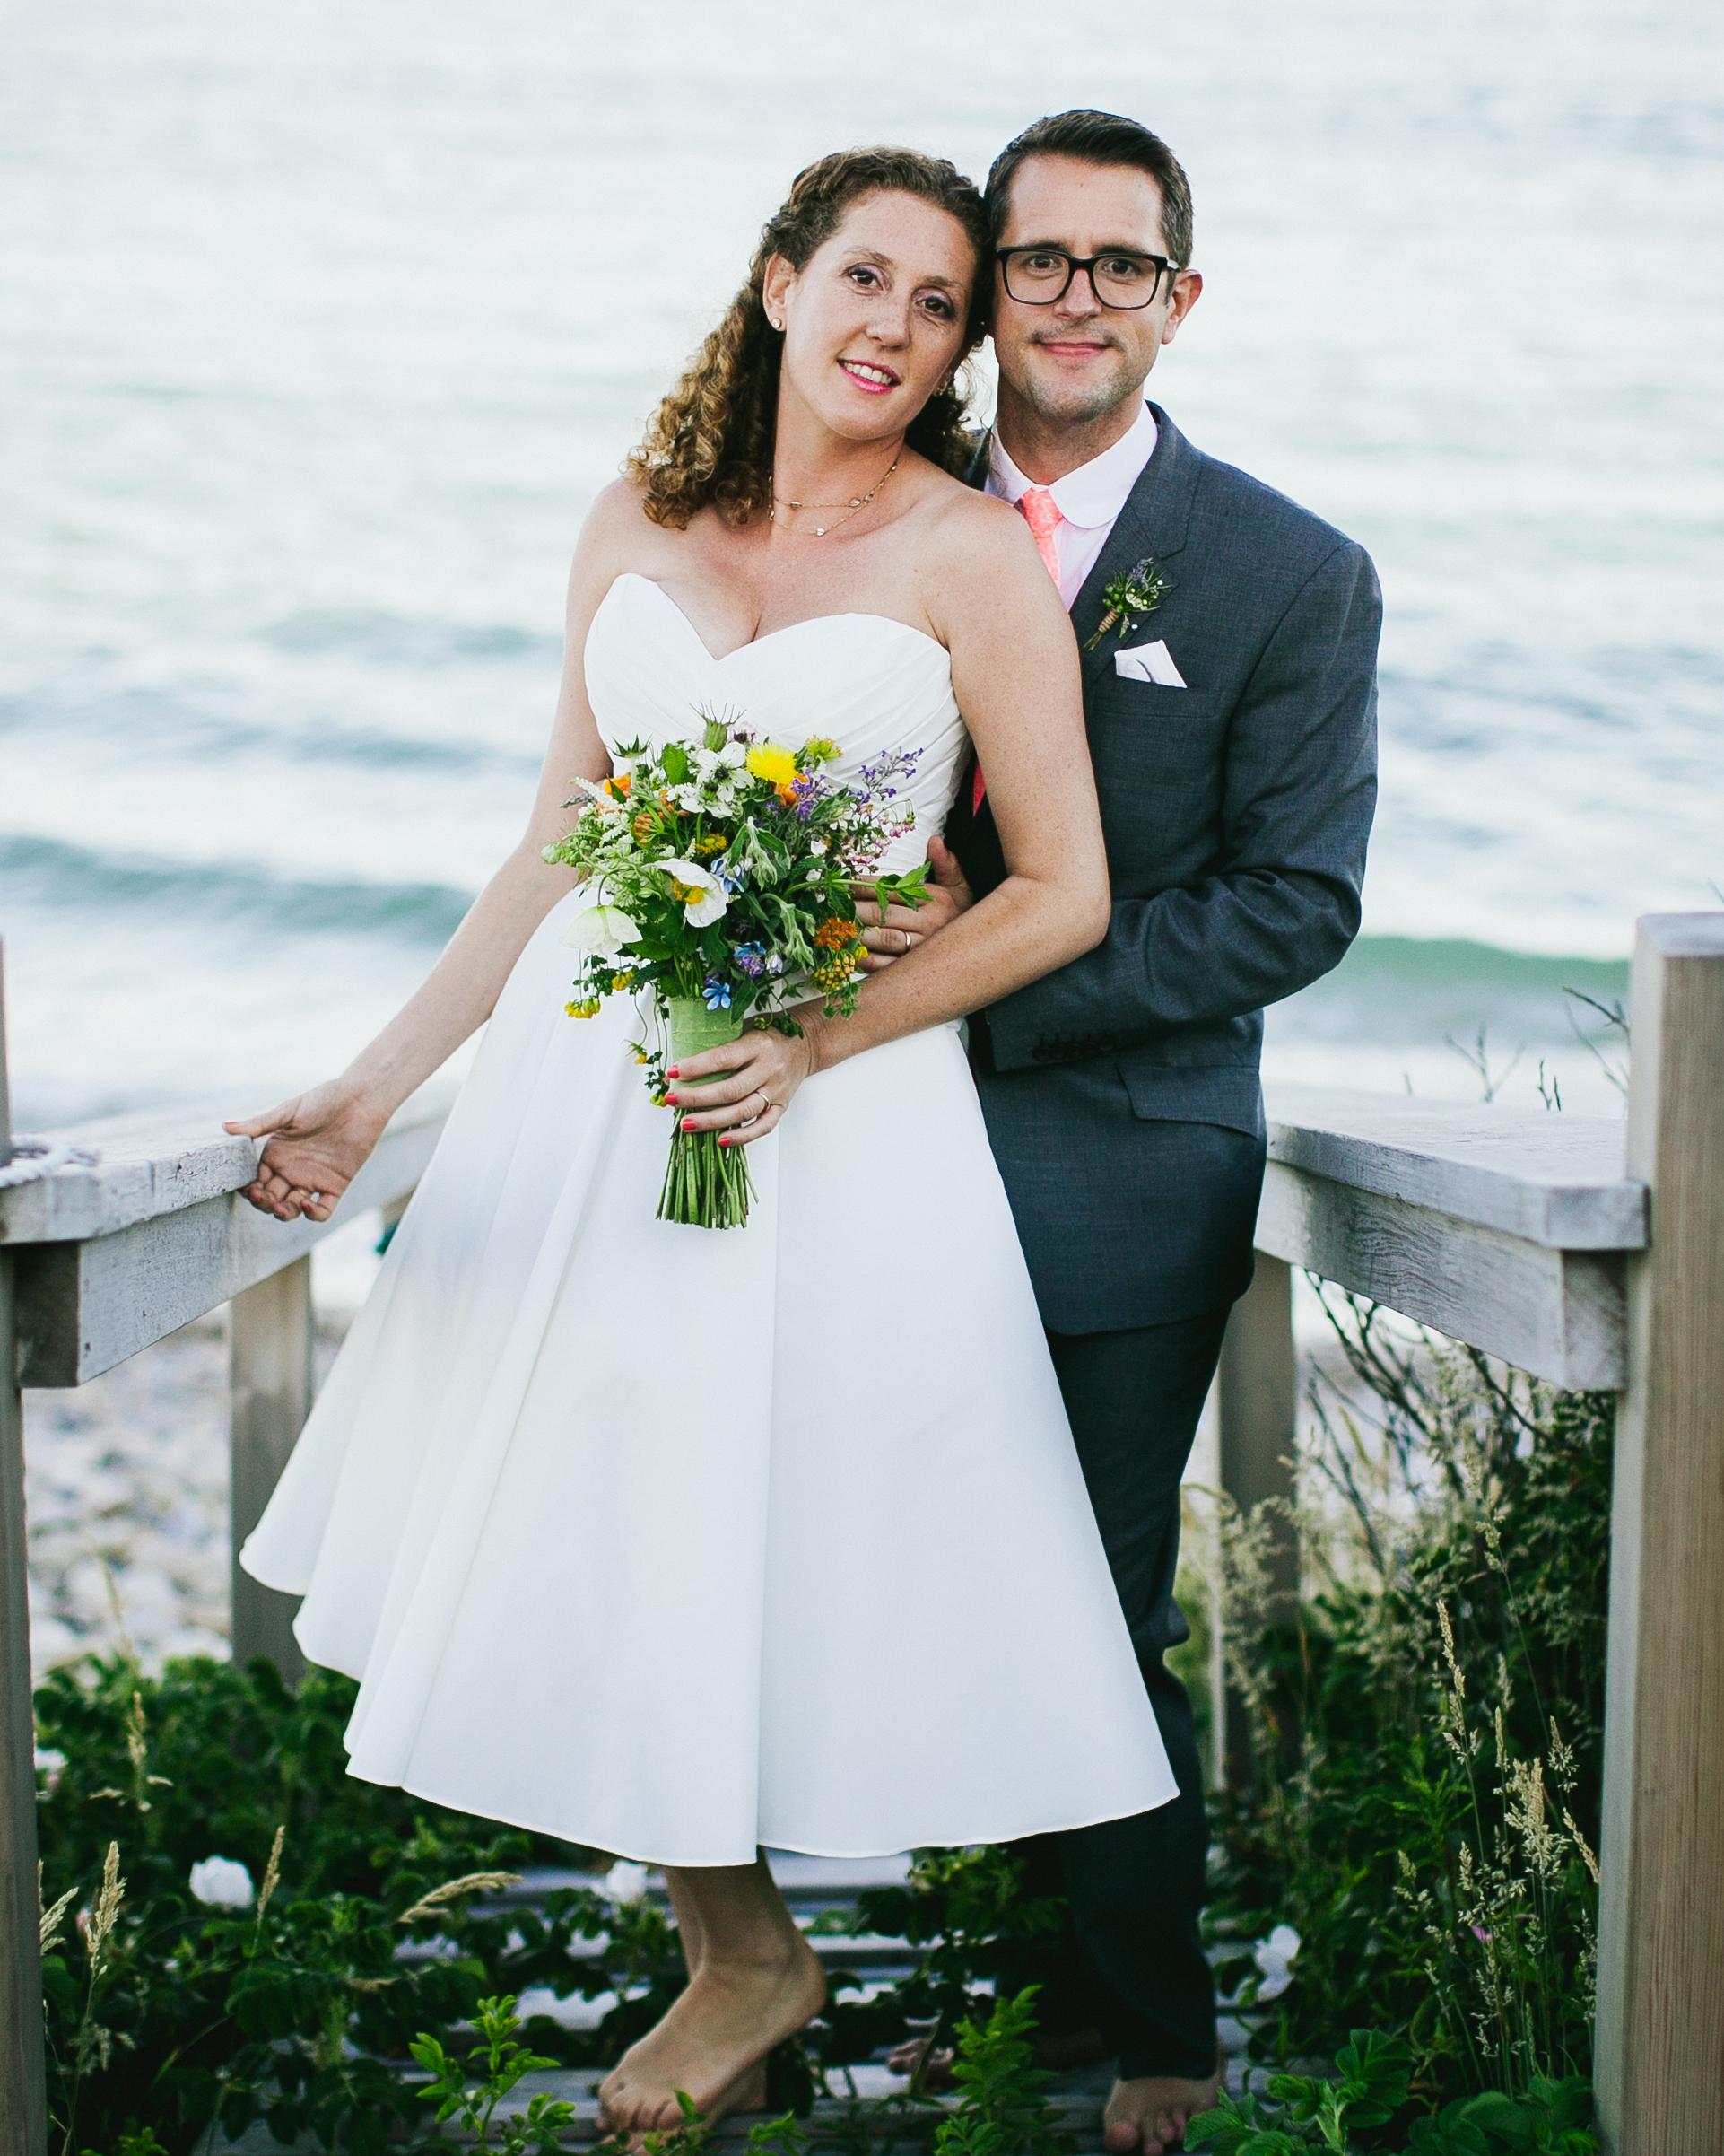 gabriela-tyson-wedding-couple-0804-s111708-1214.jpg